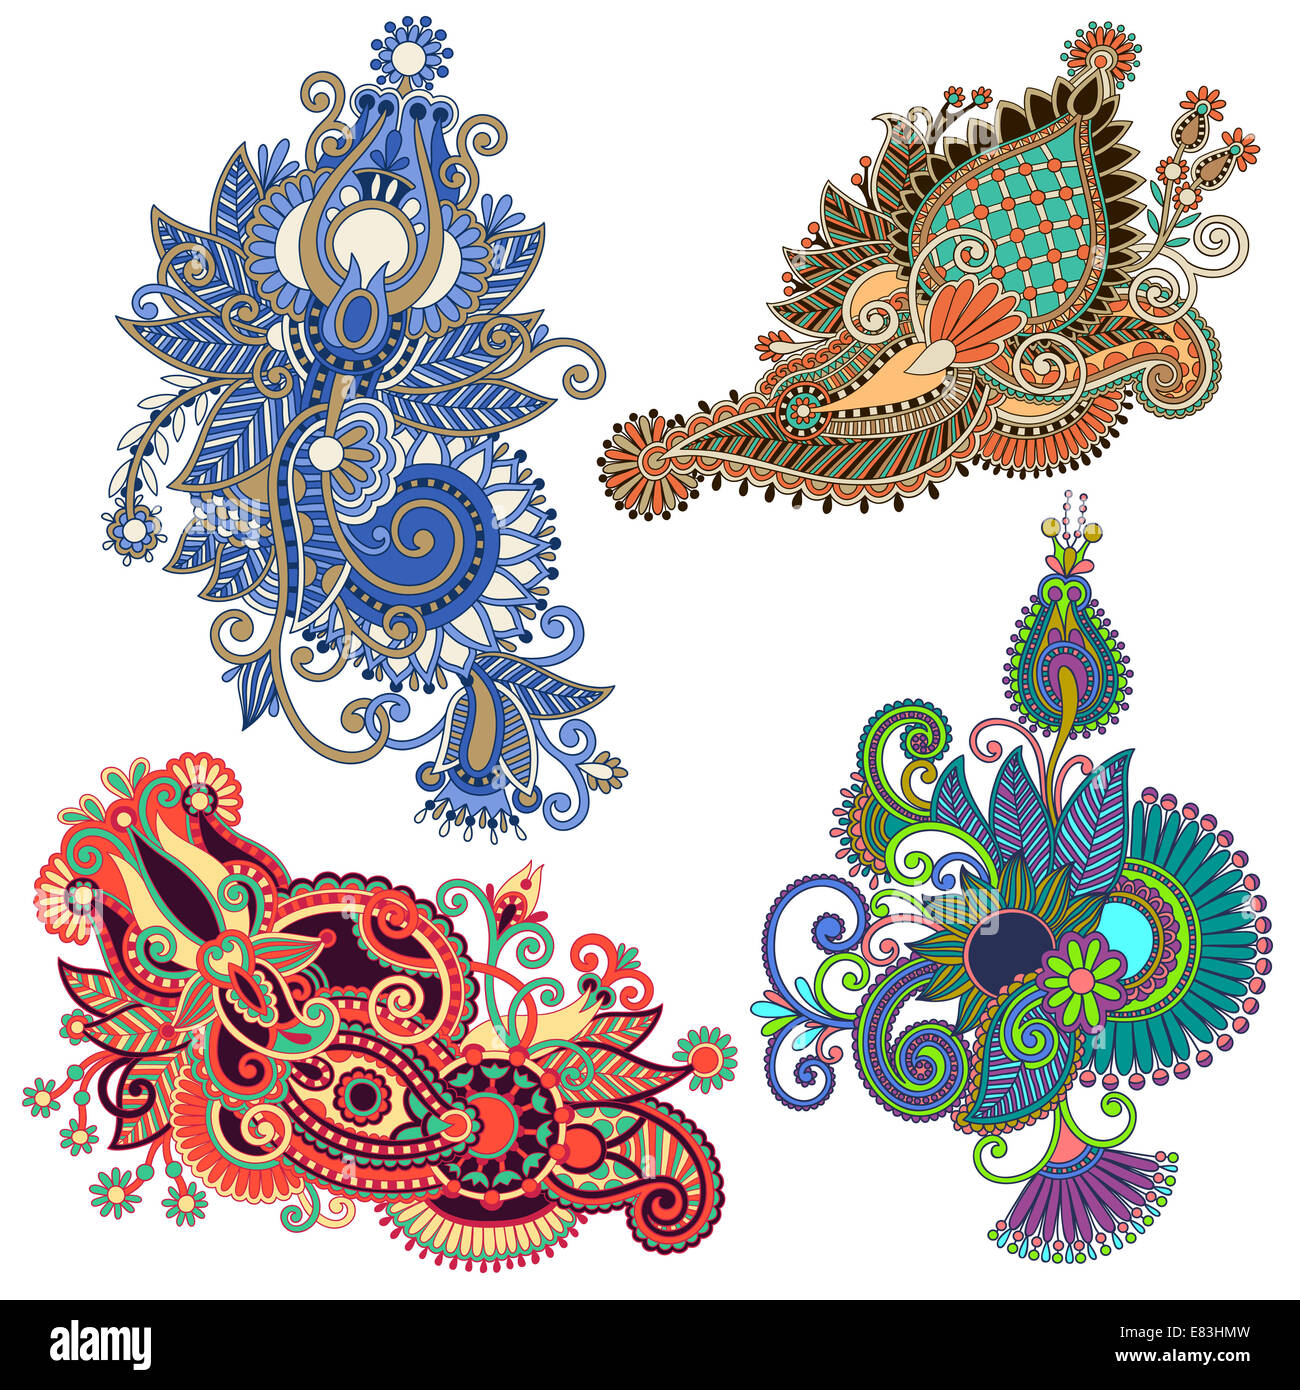 Line Art Ornate Flower Design : Original hand draw line art ornate flower design